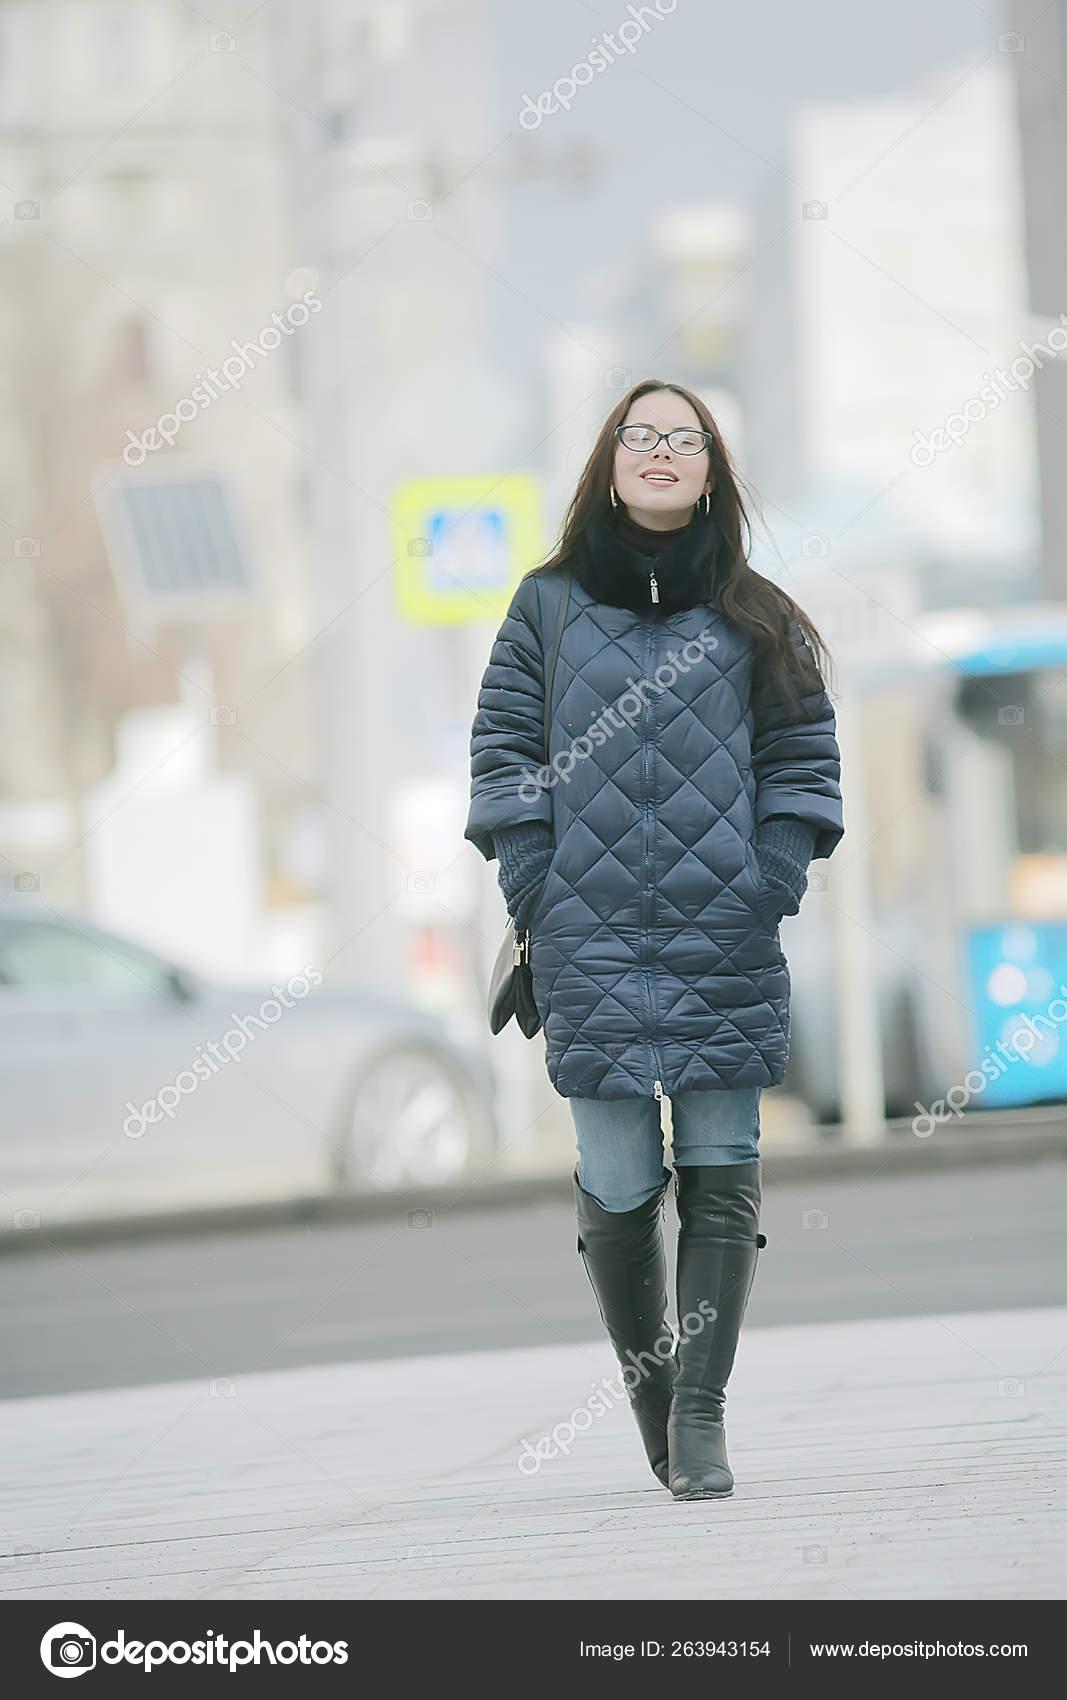 Model In Christmas Vacation.Adult Model Girl Coat Winter Walk City Christmas Vacation